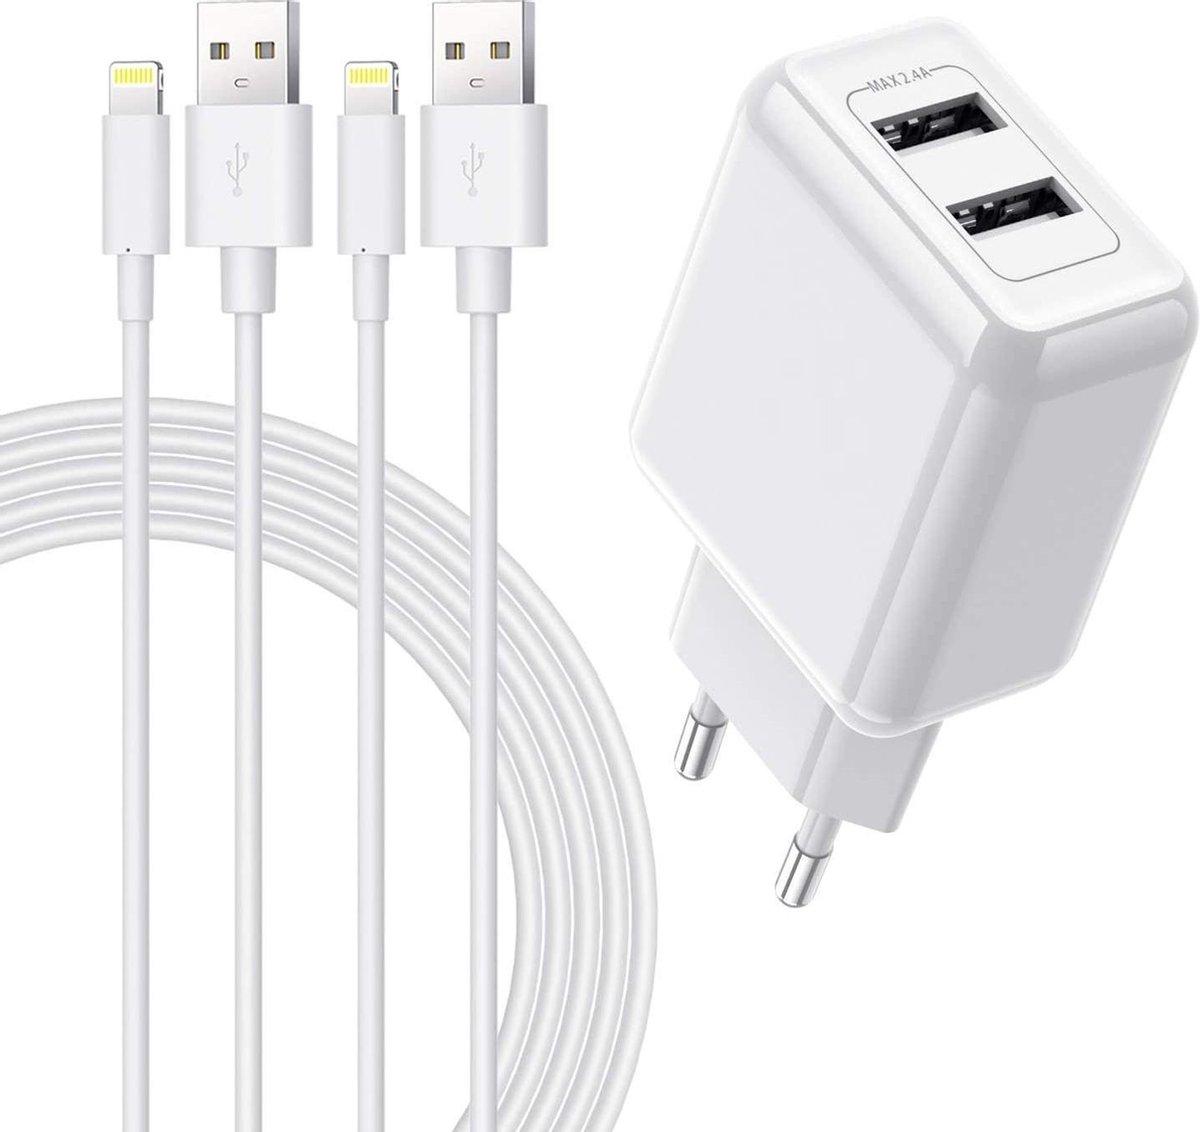 Xssive 12 W 2 poorts iPhone-oplader + 2 stuks 2 meter iPhone-oplaadkabel | [gecertificeerd] USB-voeding en Lightning-kabel voor iPhone SE 2020 XS Max XR X 8 Plus 7 Plus 6 Plus 5s SE iPad Airpods